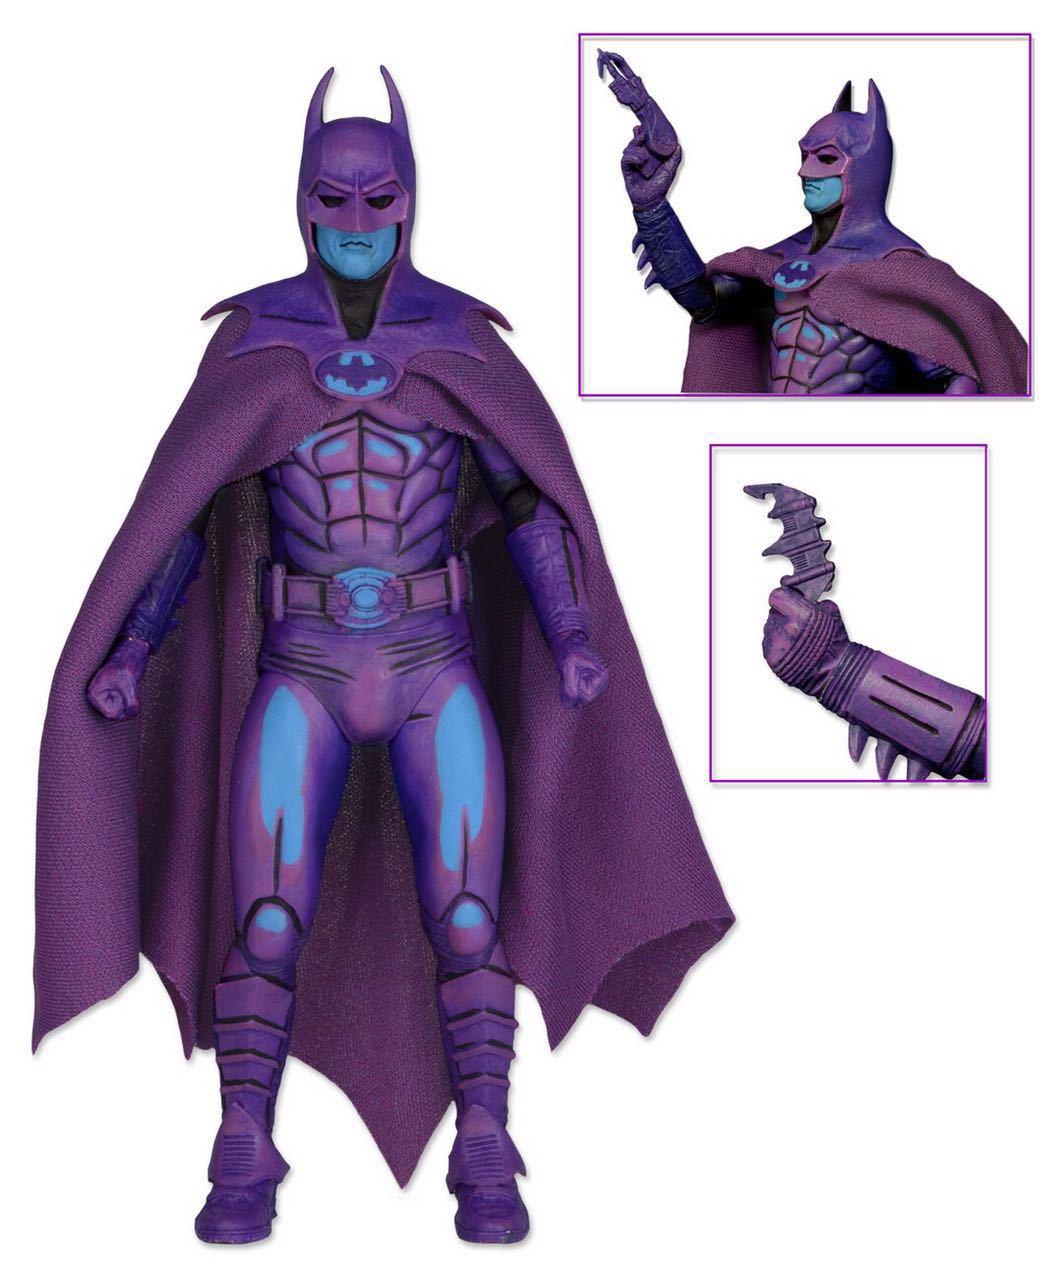 Regalo de Halloween 18cm Modelo figura móvil conjunto de superhéroe de NECA CC Batman